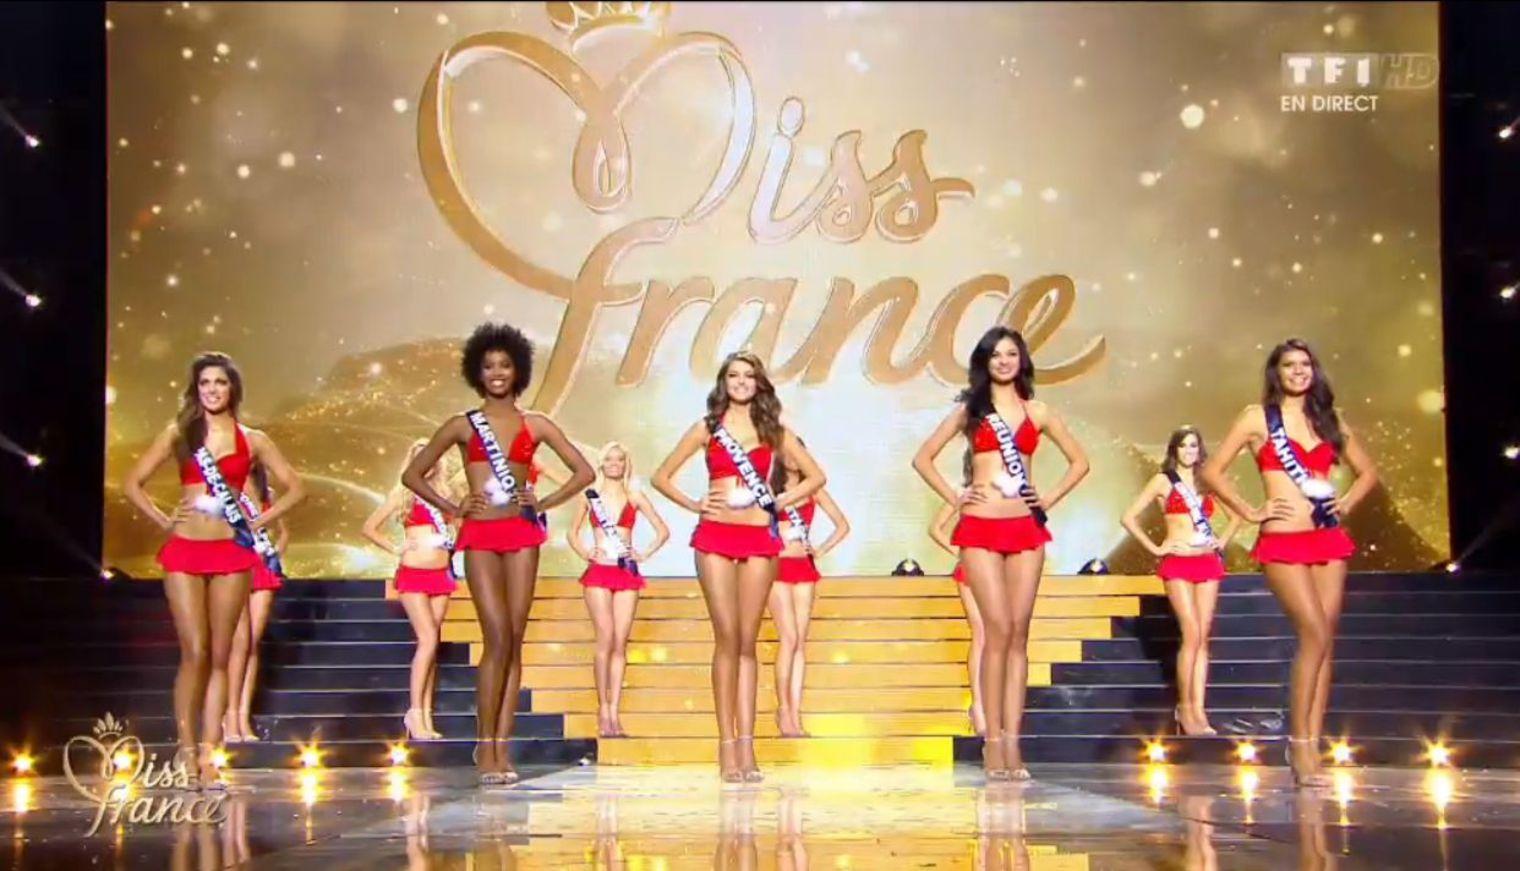 finalistes-miss-france-2016_5487048